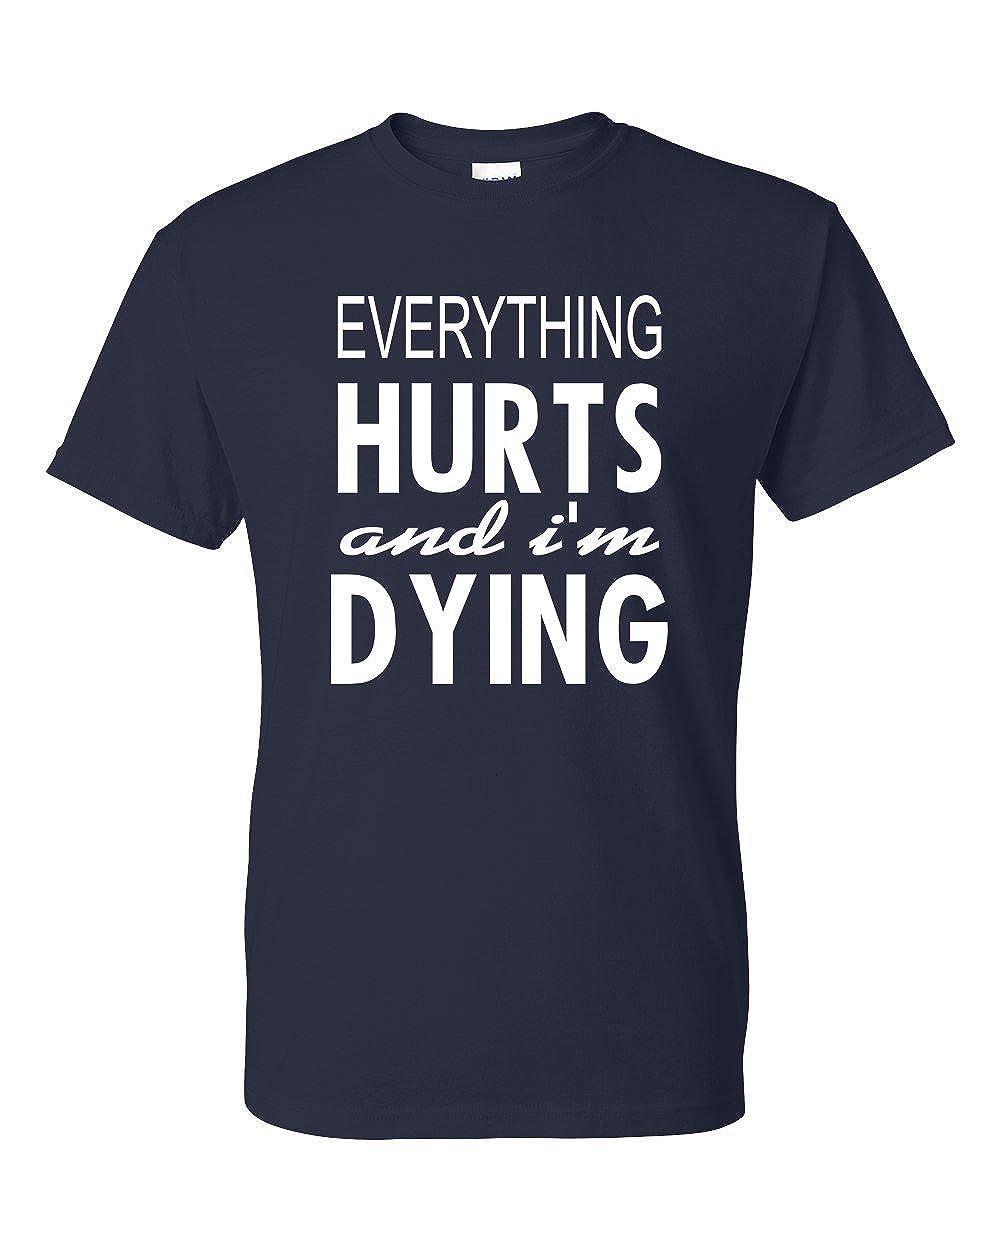 Everything Hurts and Im Dying Funny Shirt T-Shirt Navy Blue Medium